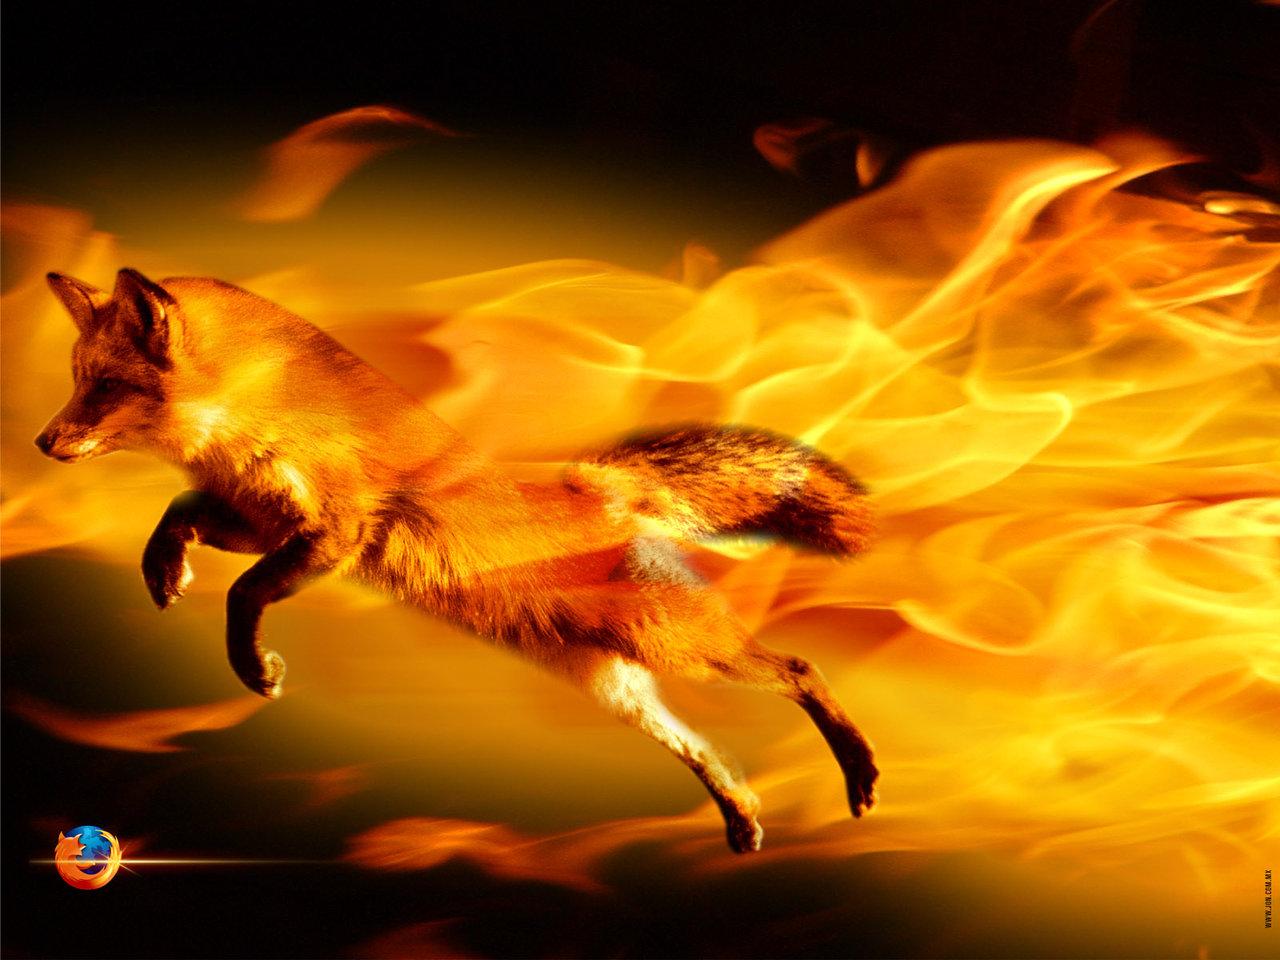 http://1.bp.blogspot.com/_TY1OI1CkW0I/S_NBbwVAC0I/AAAAAAAAAAc/sLKQDQQrkOs/s1600/firefox-wallpaper-firefox-404961_1280_960.jpg